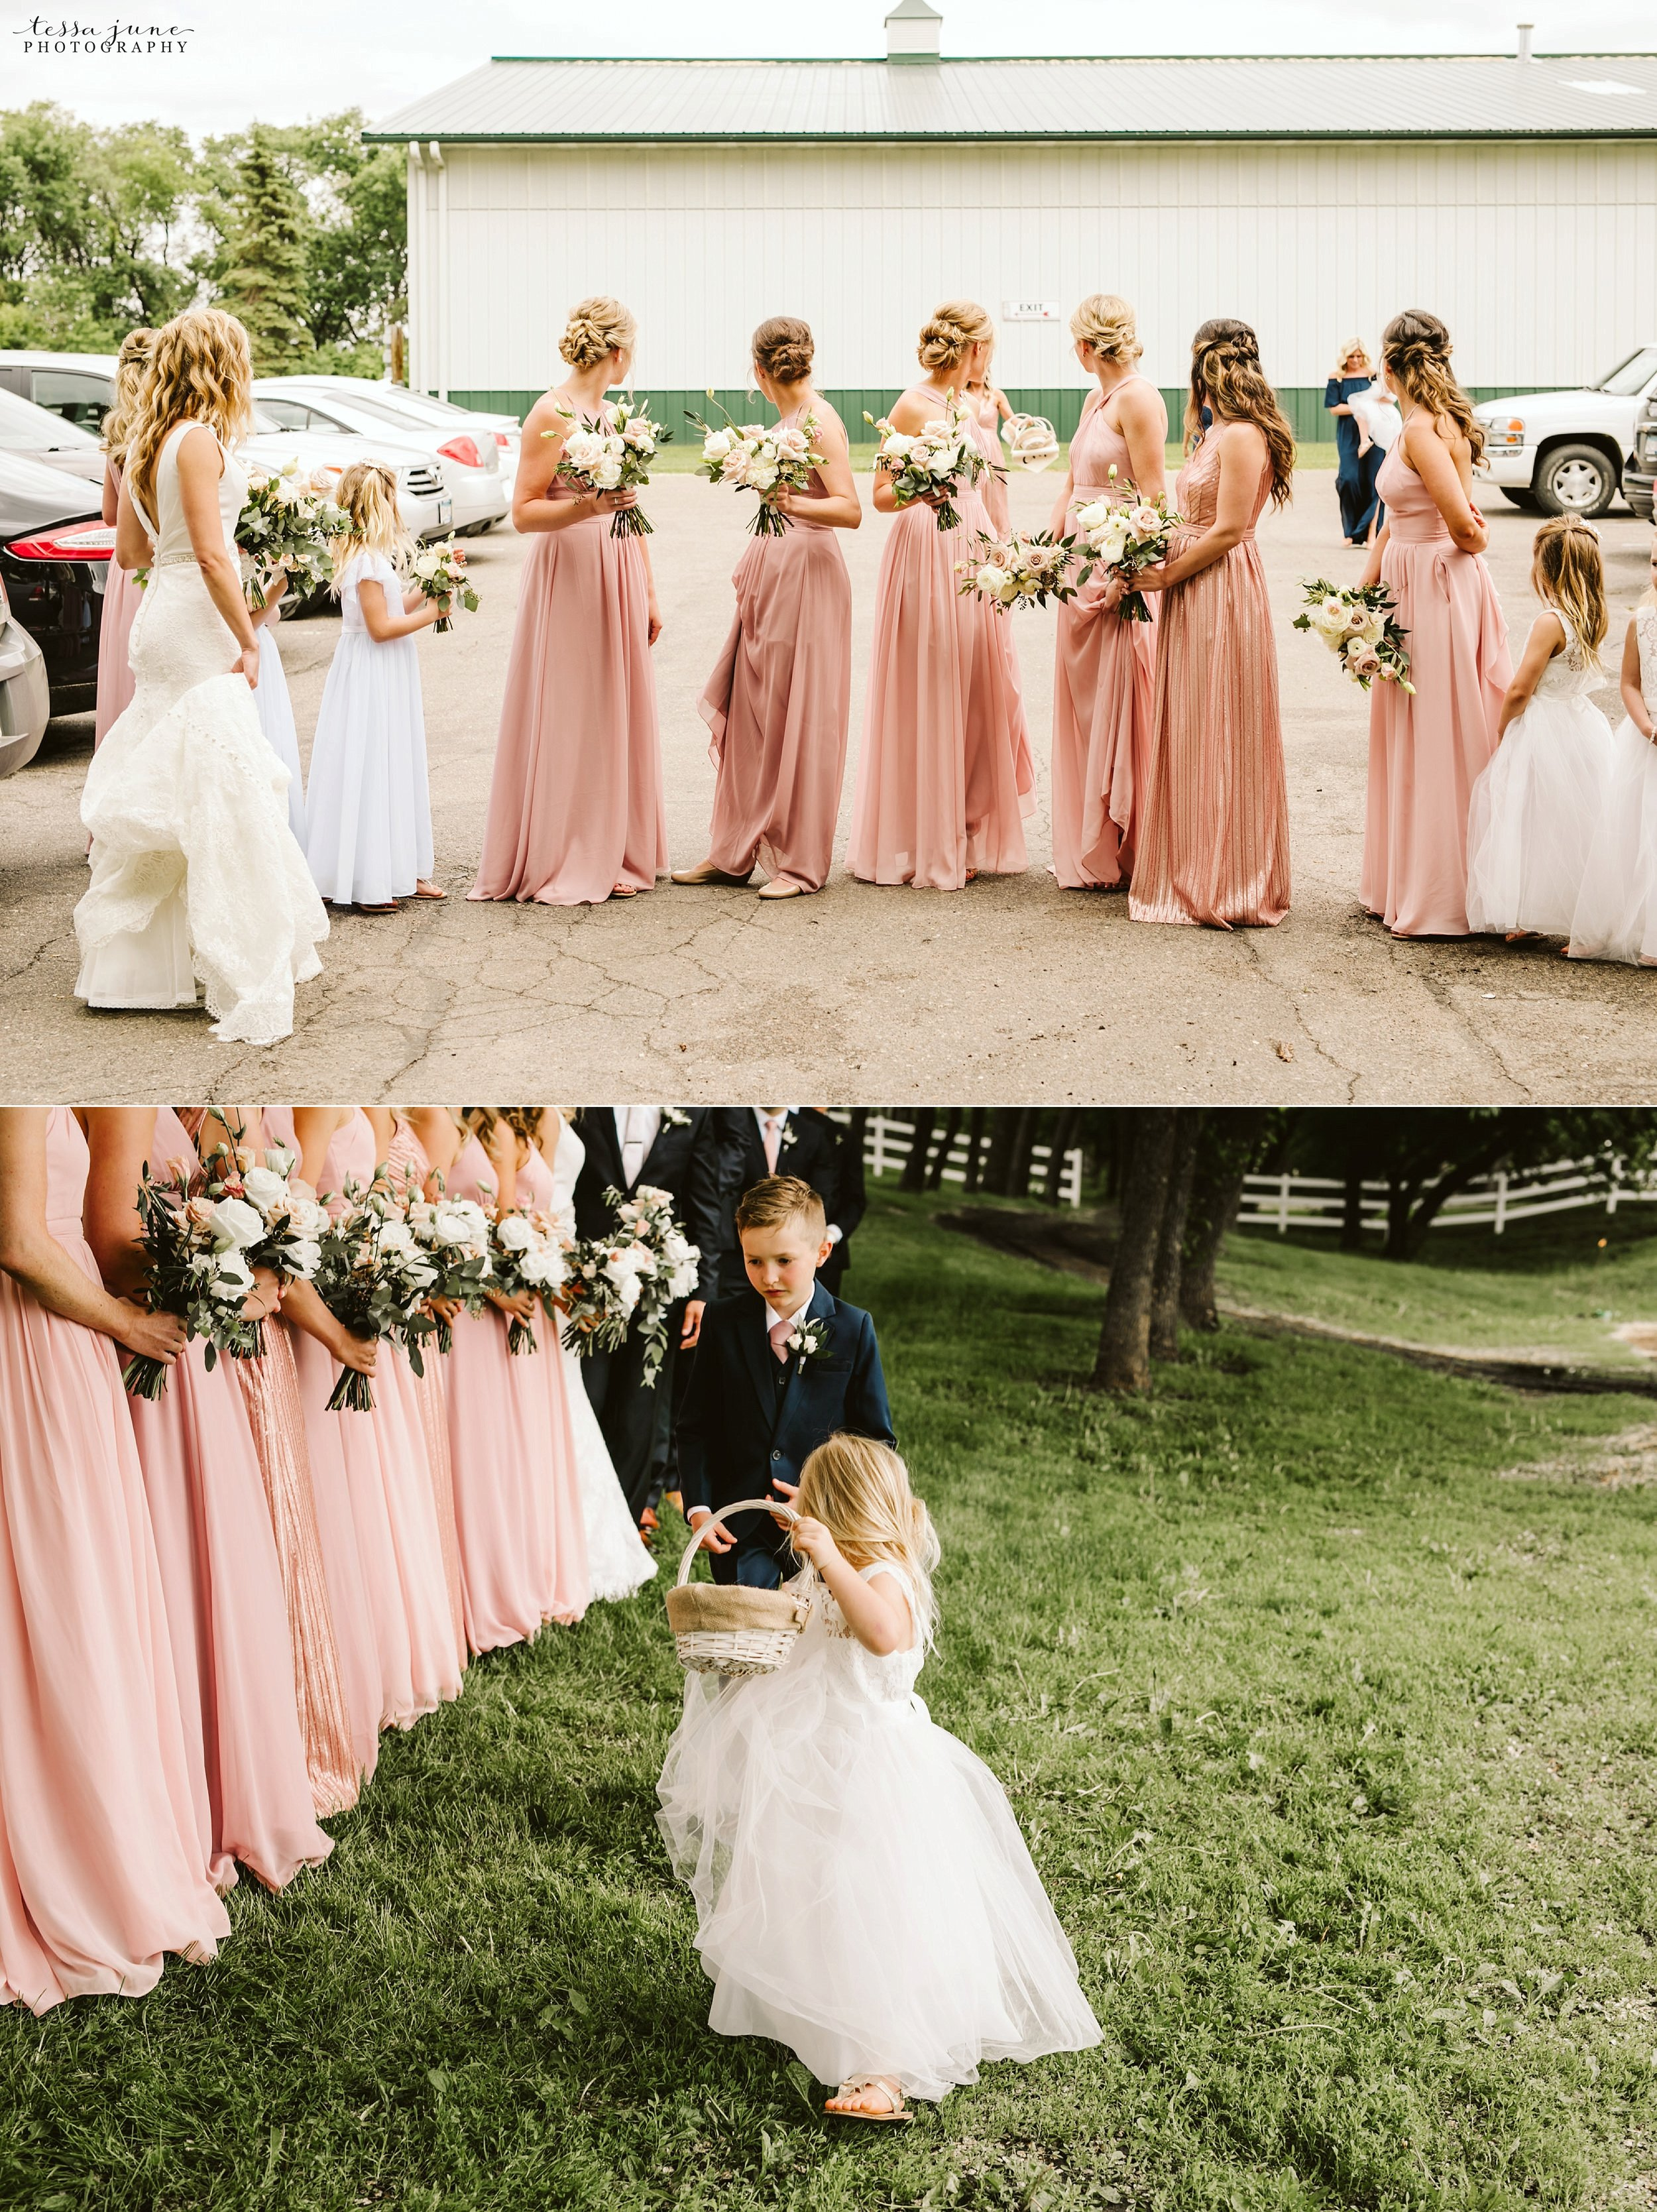 carlos-creek-winery-wedding-summer-pristine-floral-blush-pink-navy-alexandria-minnesota-79.jpg